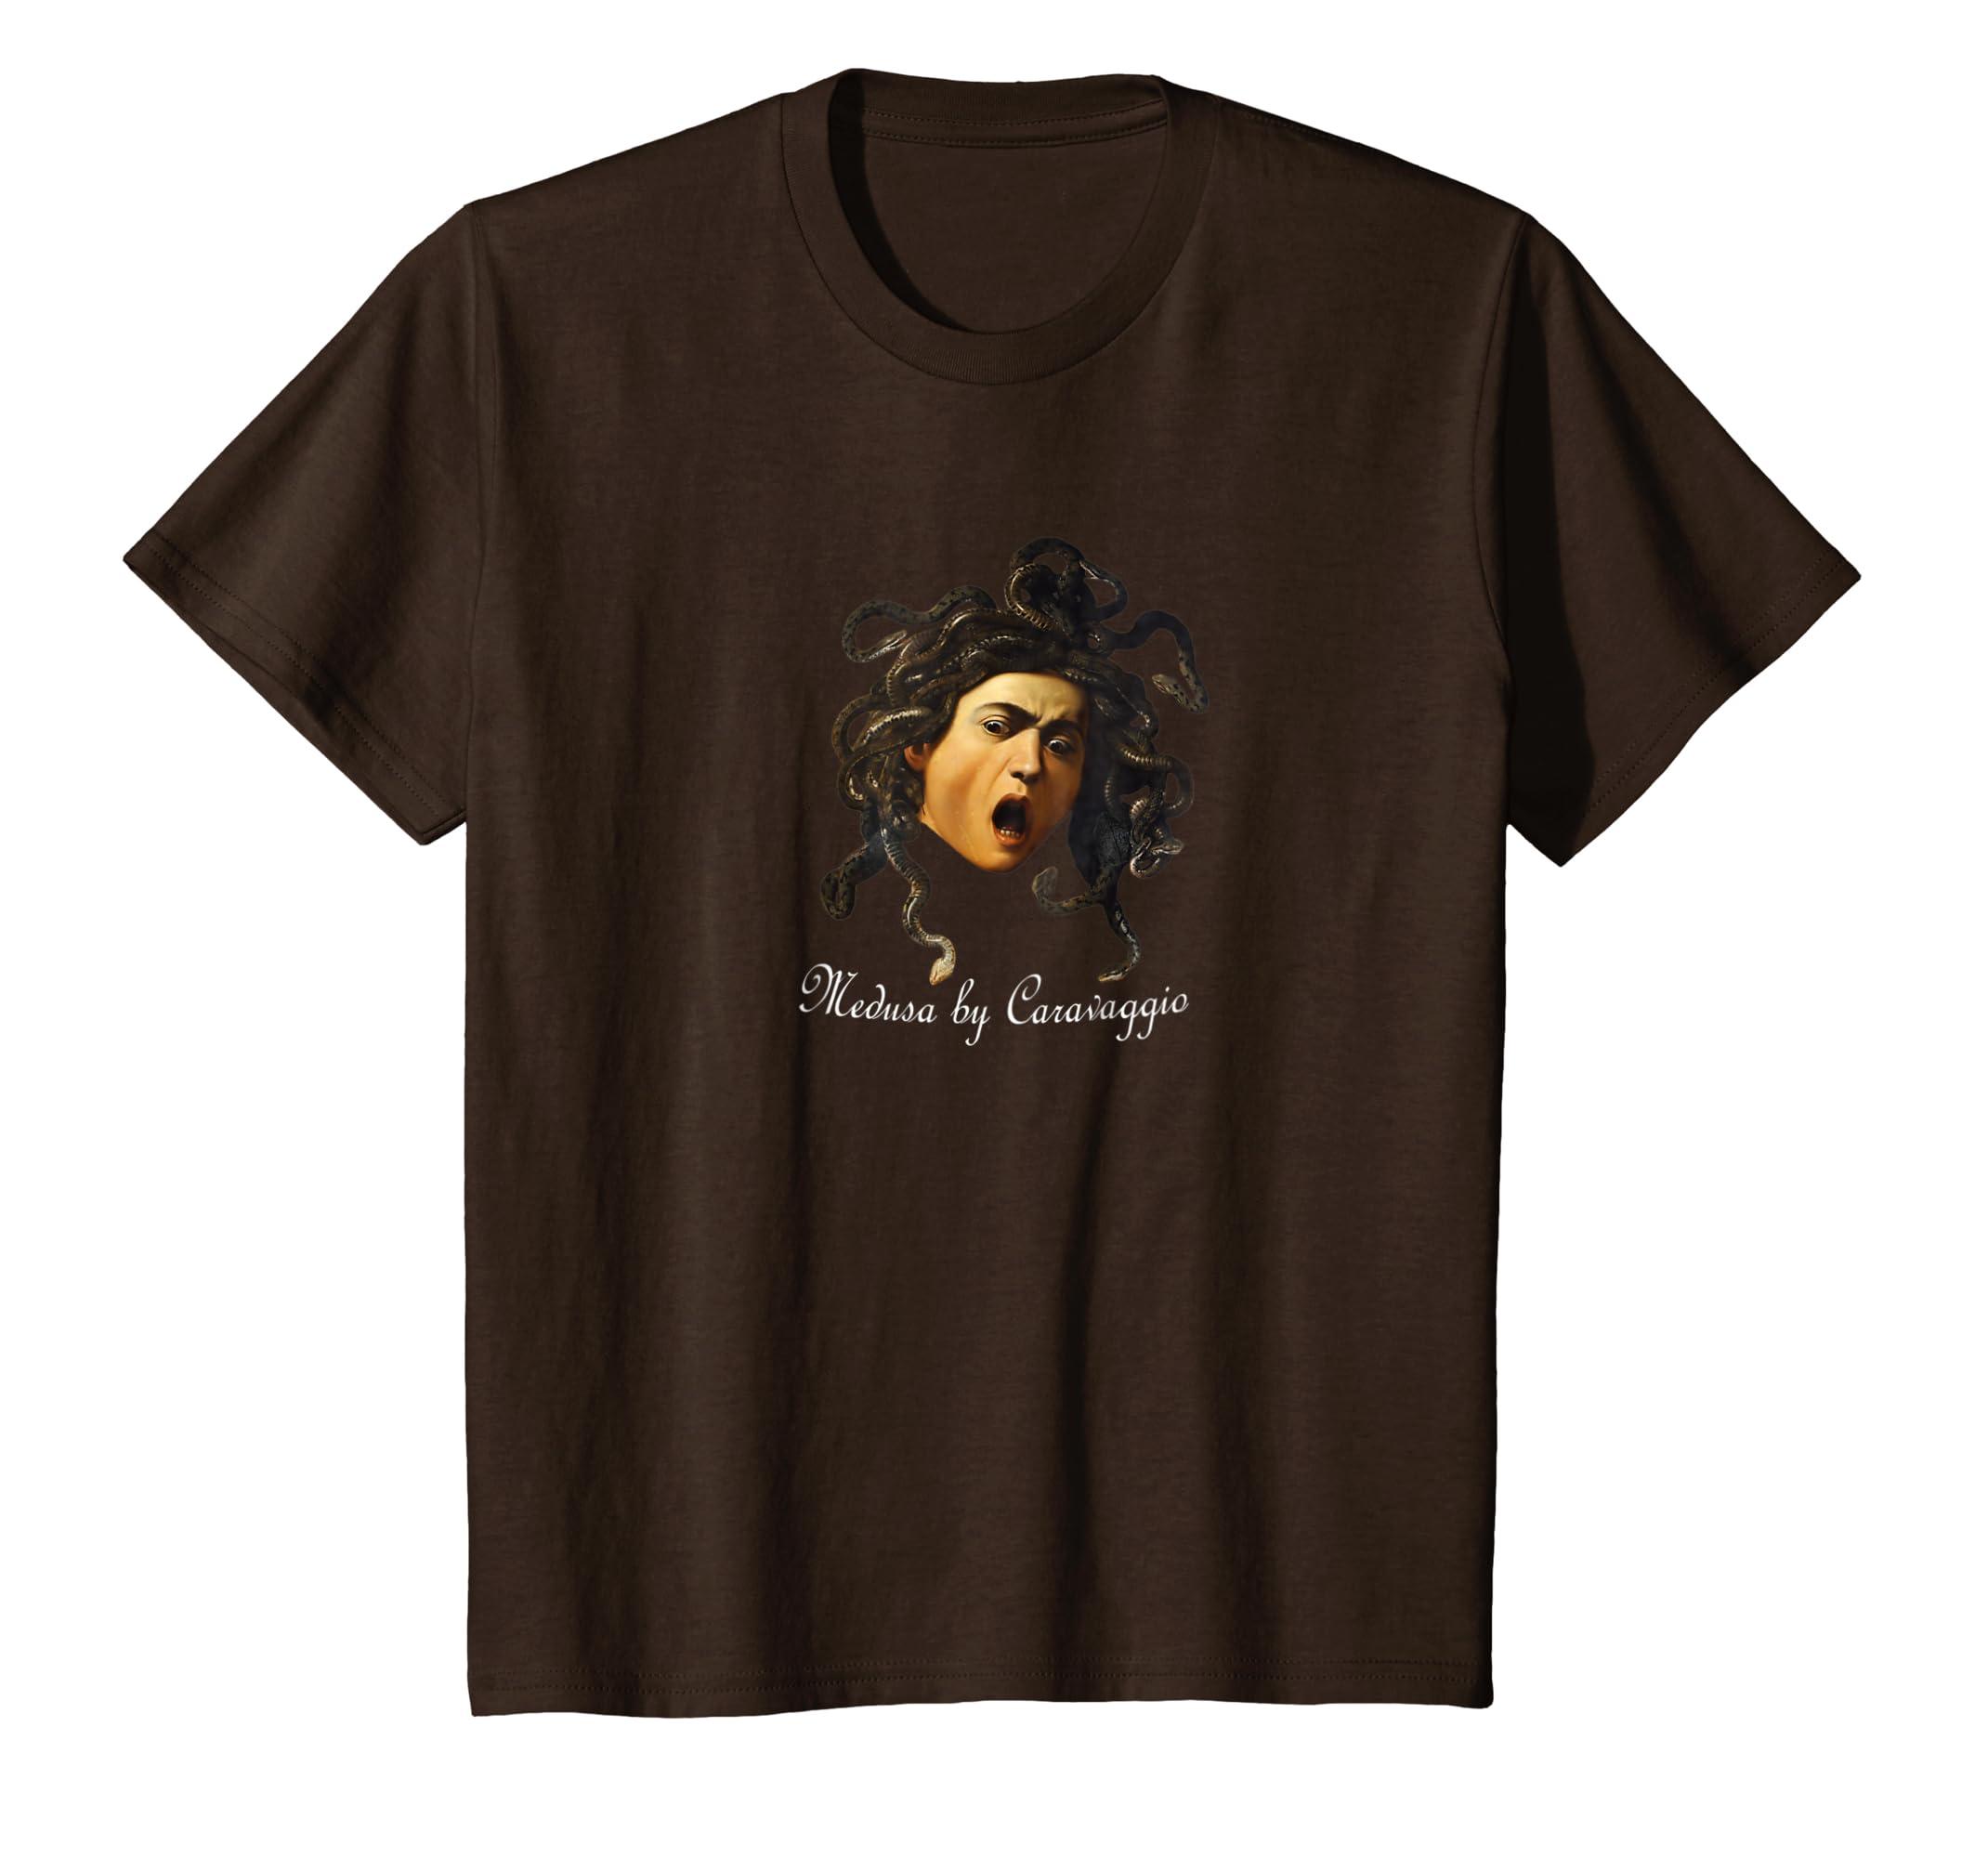 d9d3468320 Amazon.com: T-Shirt Medusa by Caravaggio: Clothing